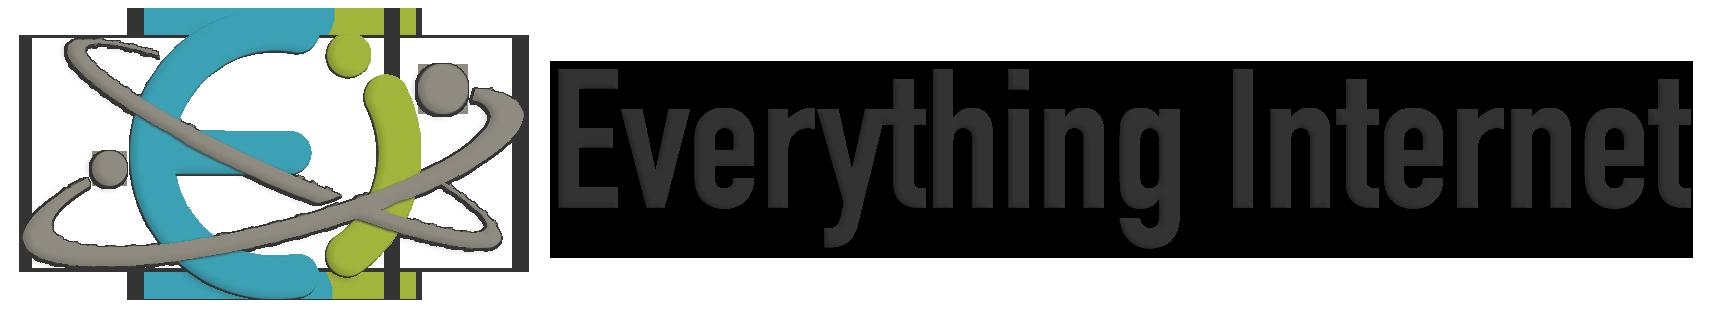 everything internet